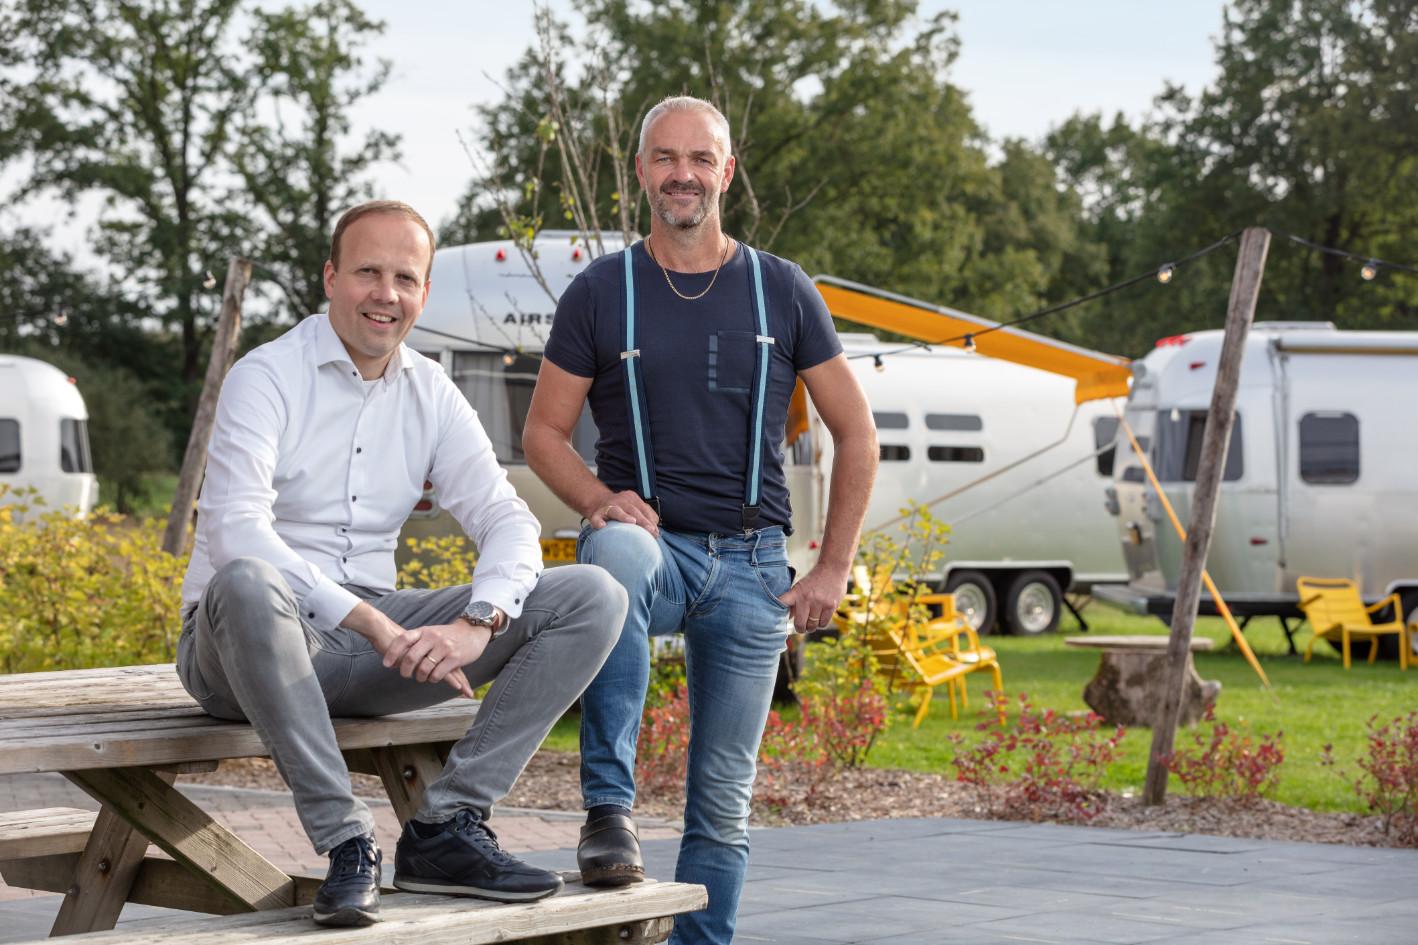 Frank Koopman van Koopman Assurantiën en Jan Steggink van Steggink Infra